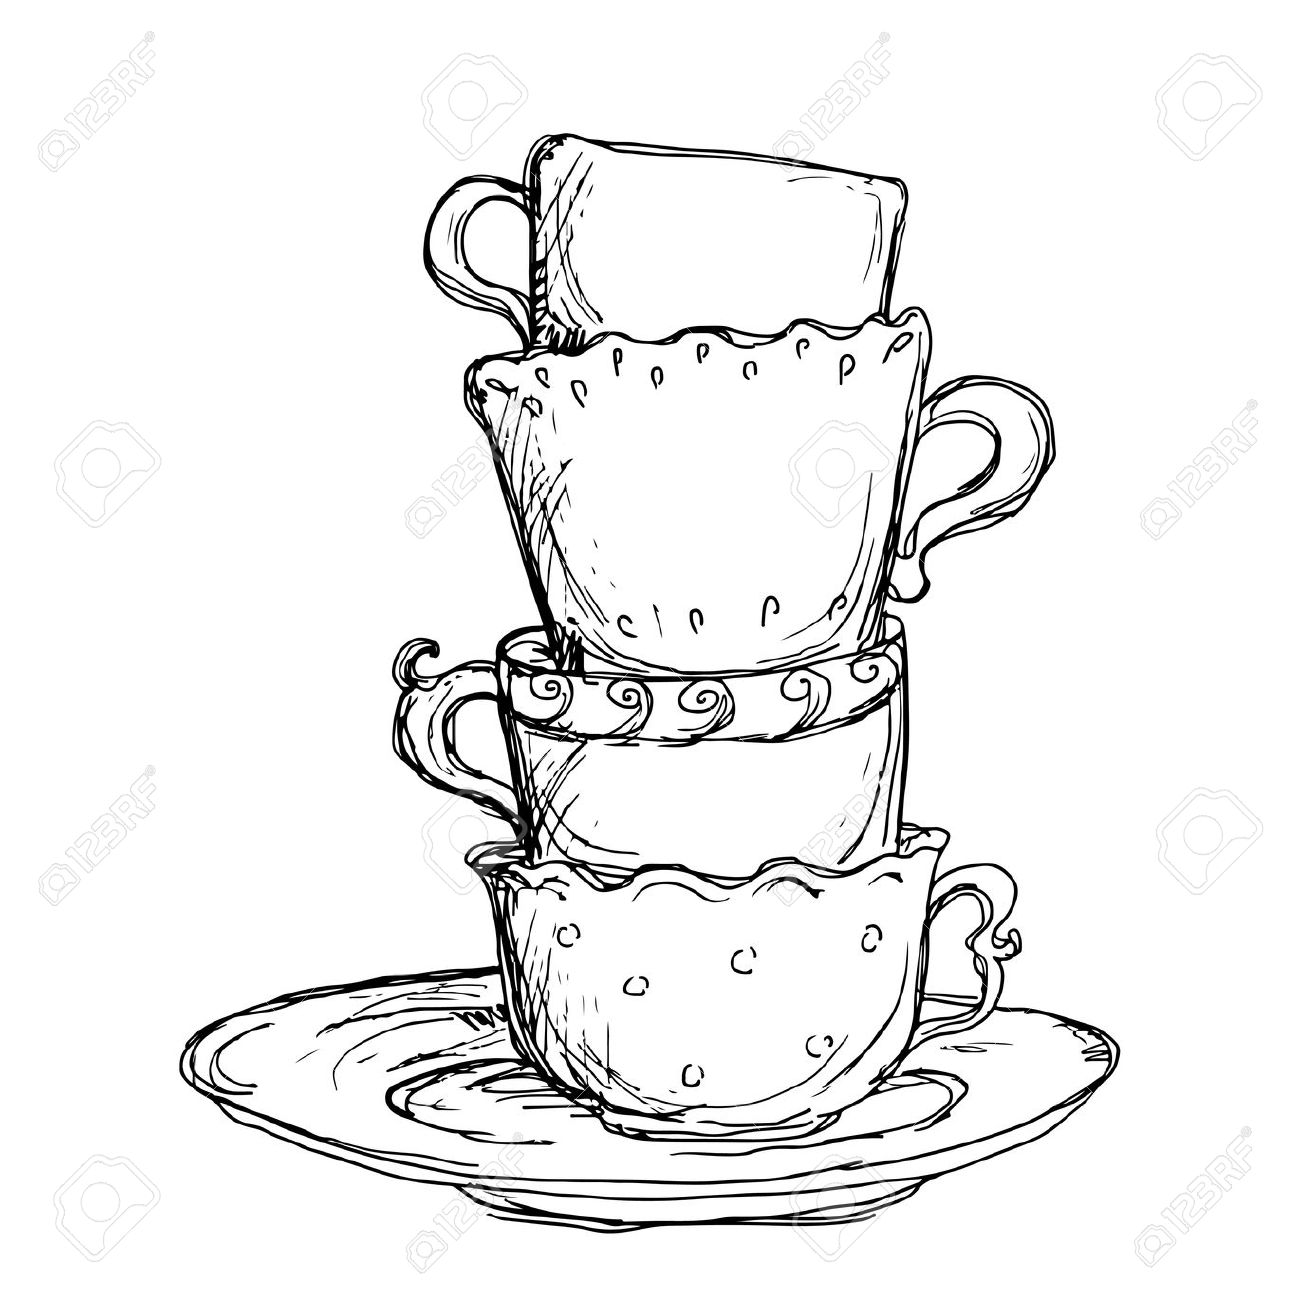 1300x1300 55 Tea Cup Sketch, Tea Set Sketch Royalty Free Stock Photos Image